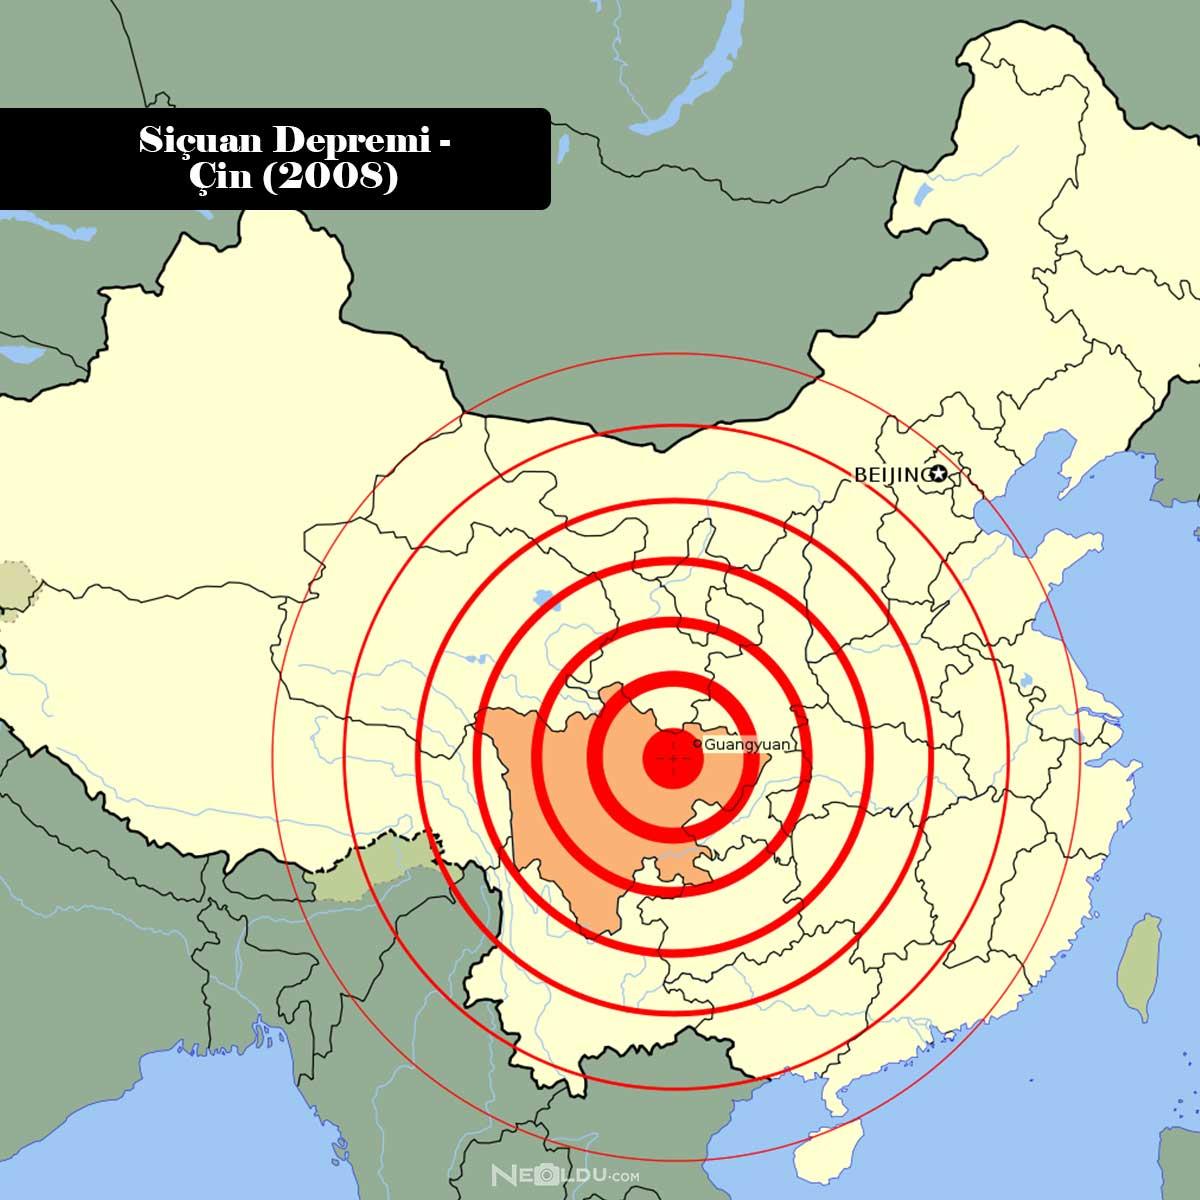 sicuan-depremi---cin-(2008).jpg